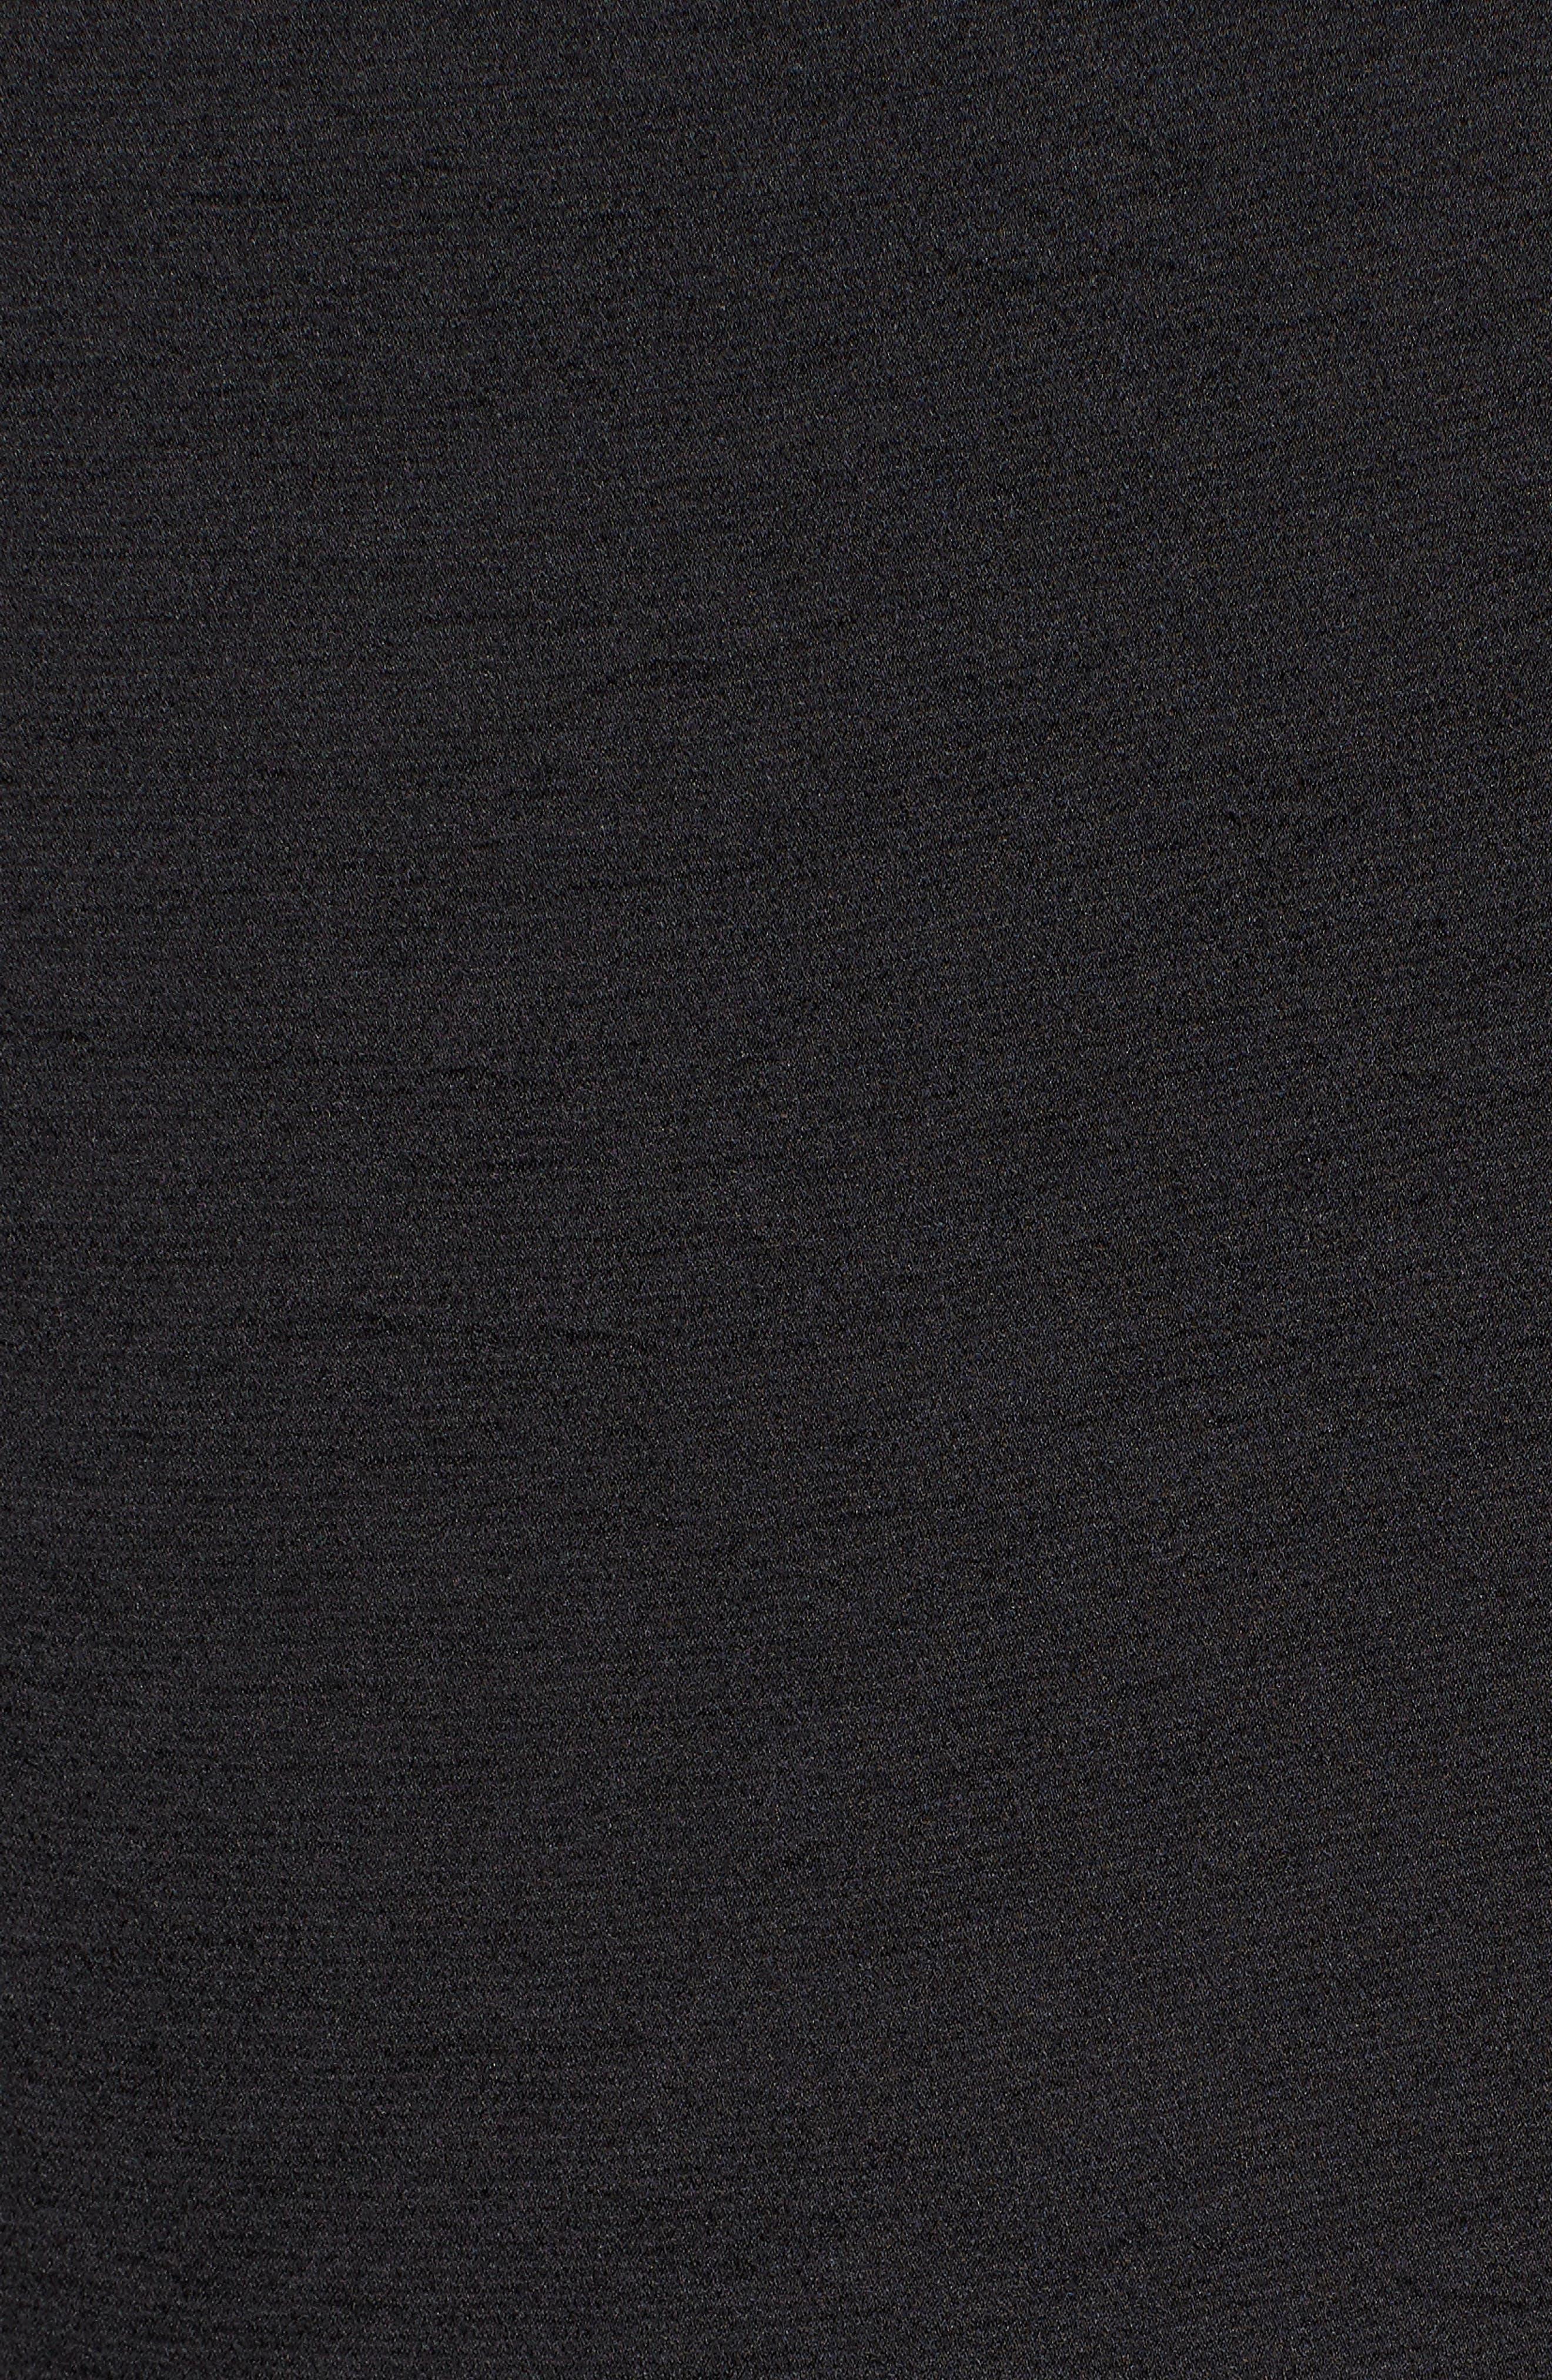 Ruffle Back Tie Top,                             Alternate thumbnail 5, color,                             BLACK